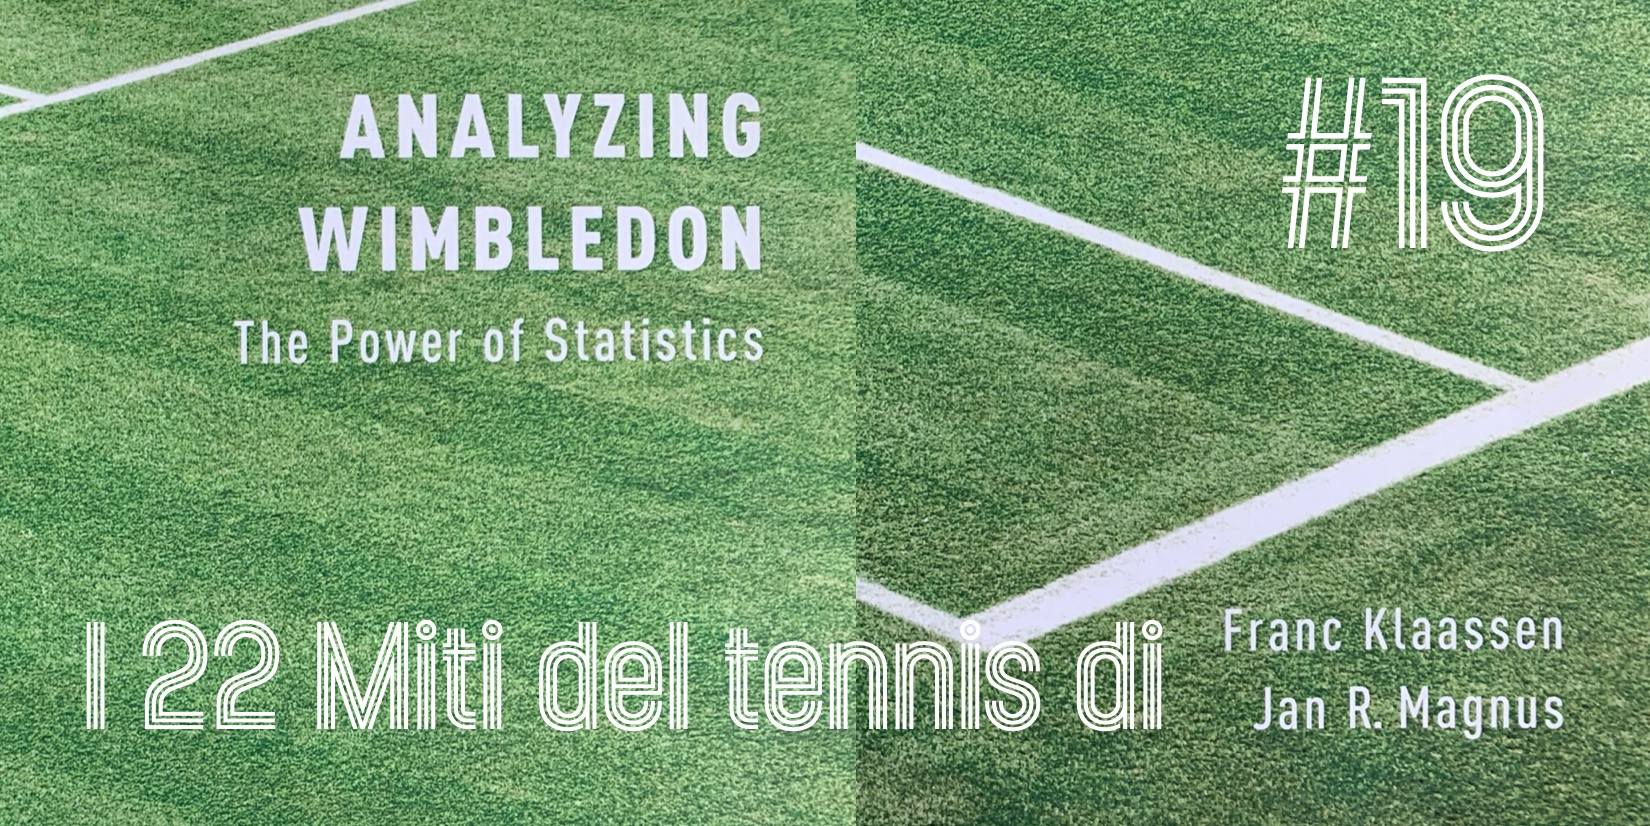 I 22 miti del tennis di Klaassen & Magnus – Mito 19 - settesei.it